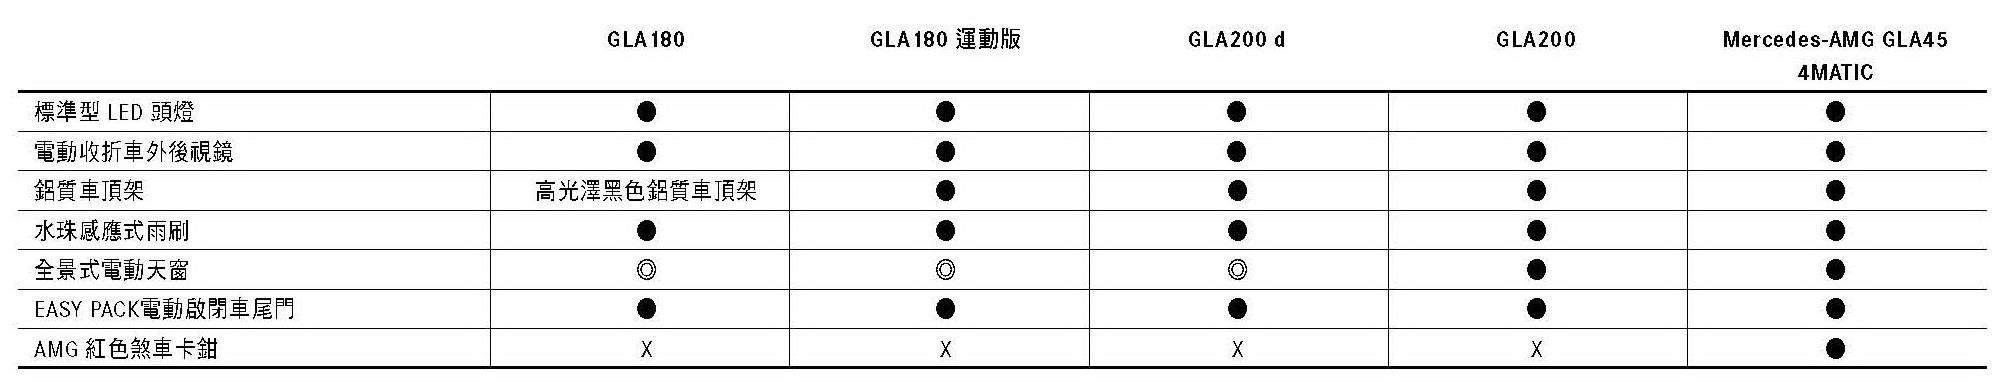 MY1718 GLA規格配備表20170510_final_頁面_07